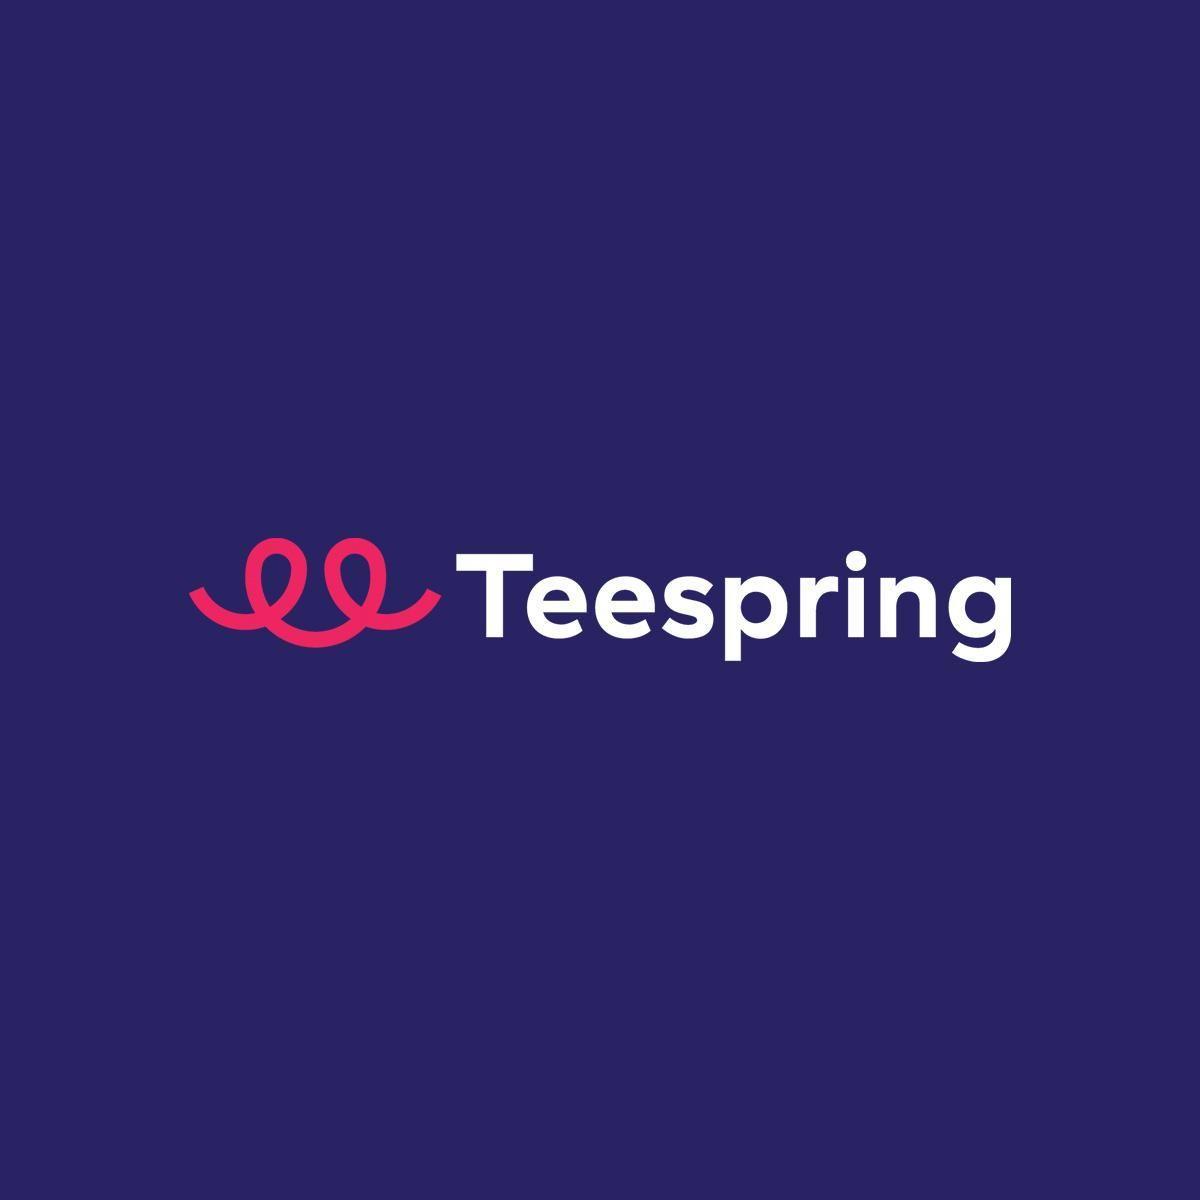 Diabetes Tee T-shirts | Unique Diabetes Tee Apparel | Teespring